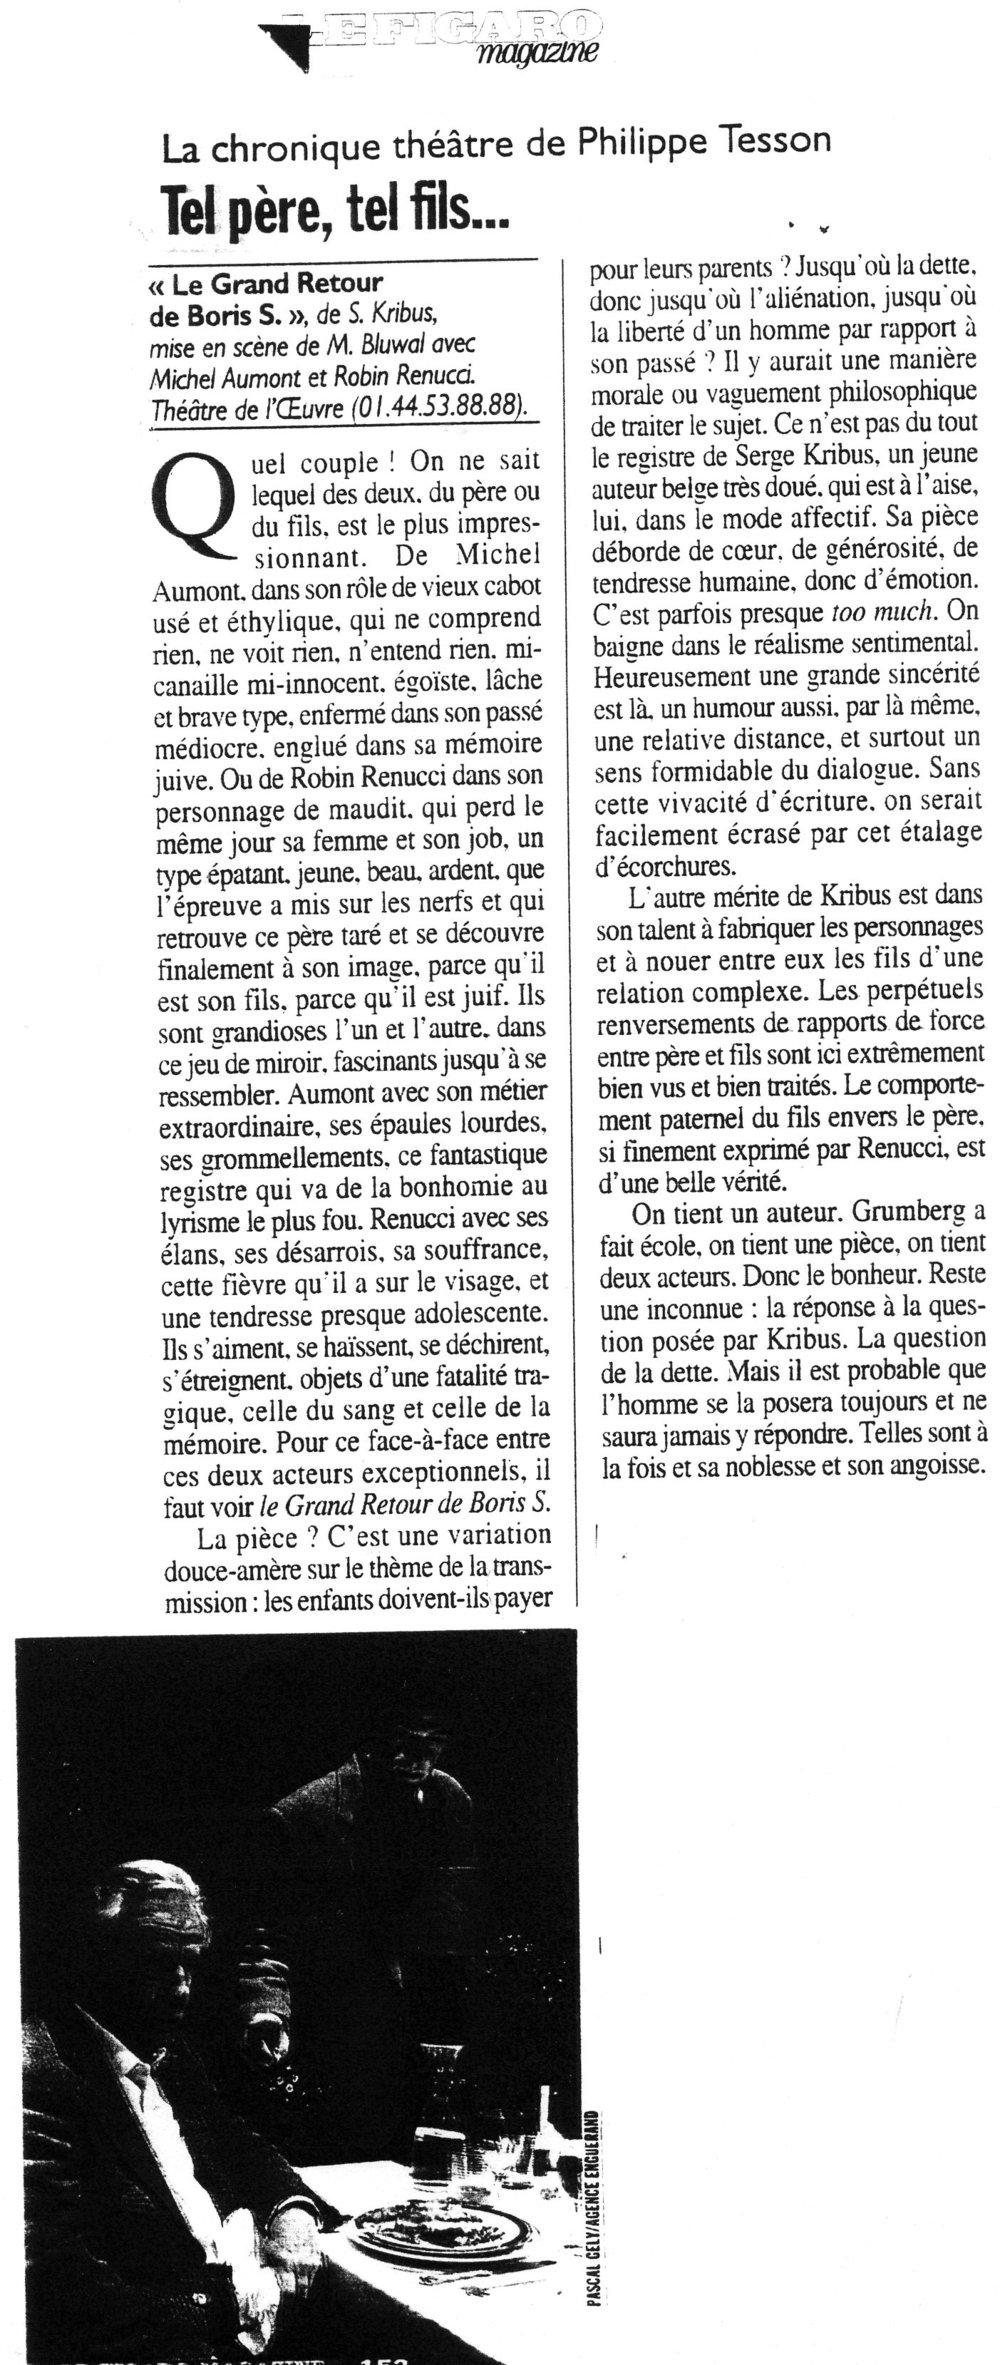 Le Figaro Magazine.jpg